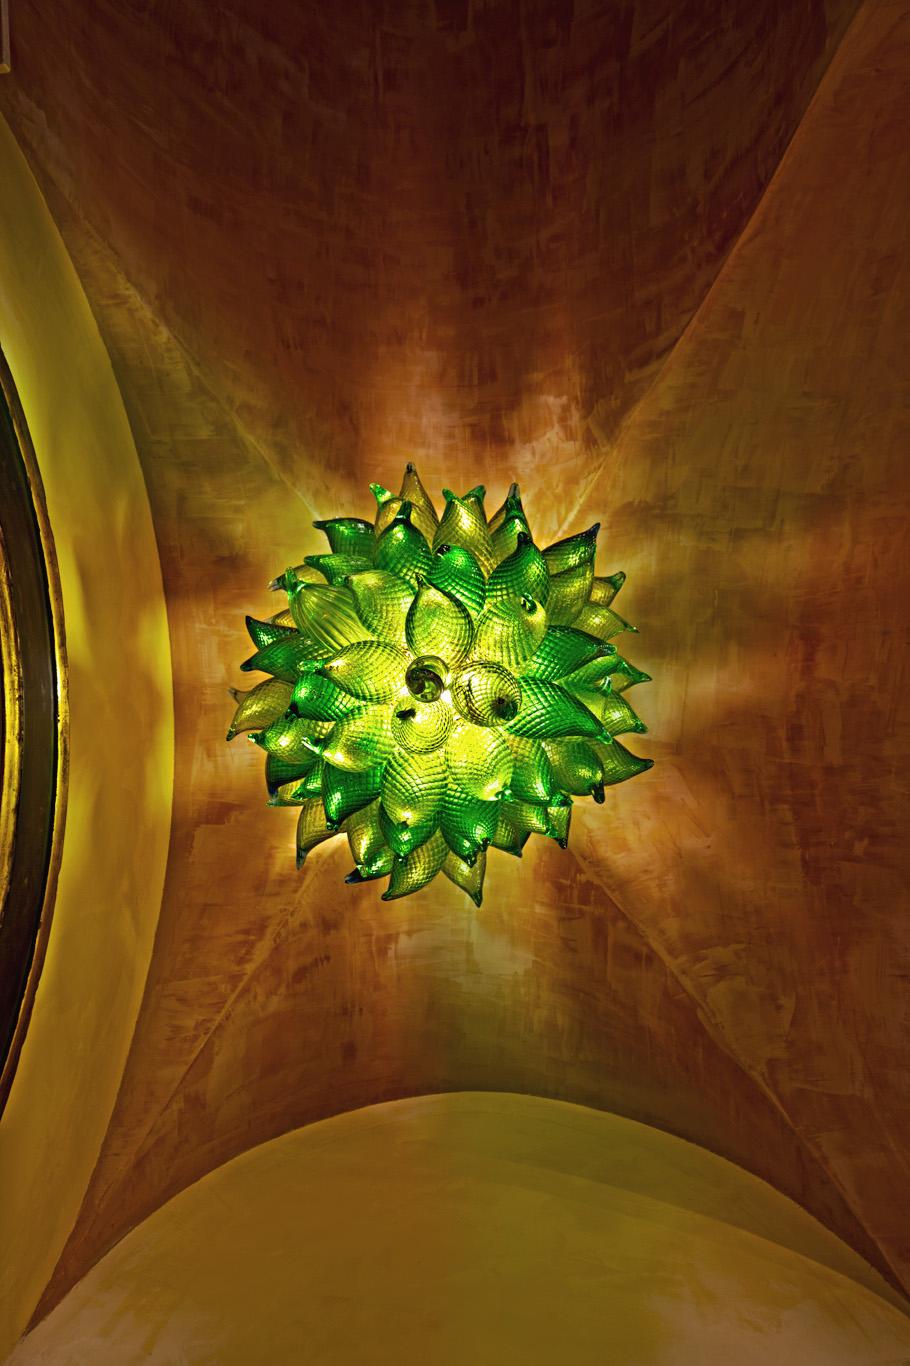 ceiling chandelier tata rick strini.jpg